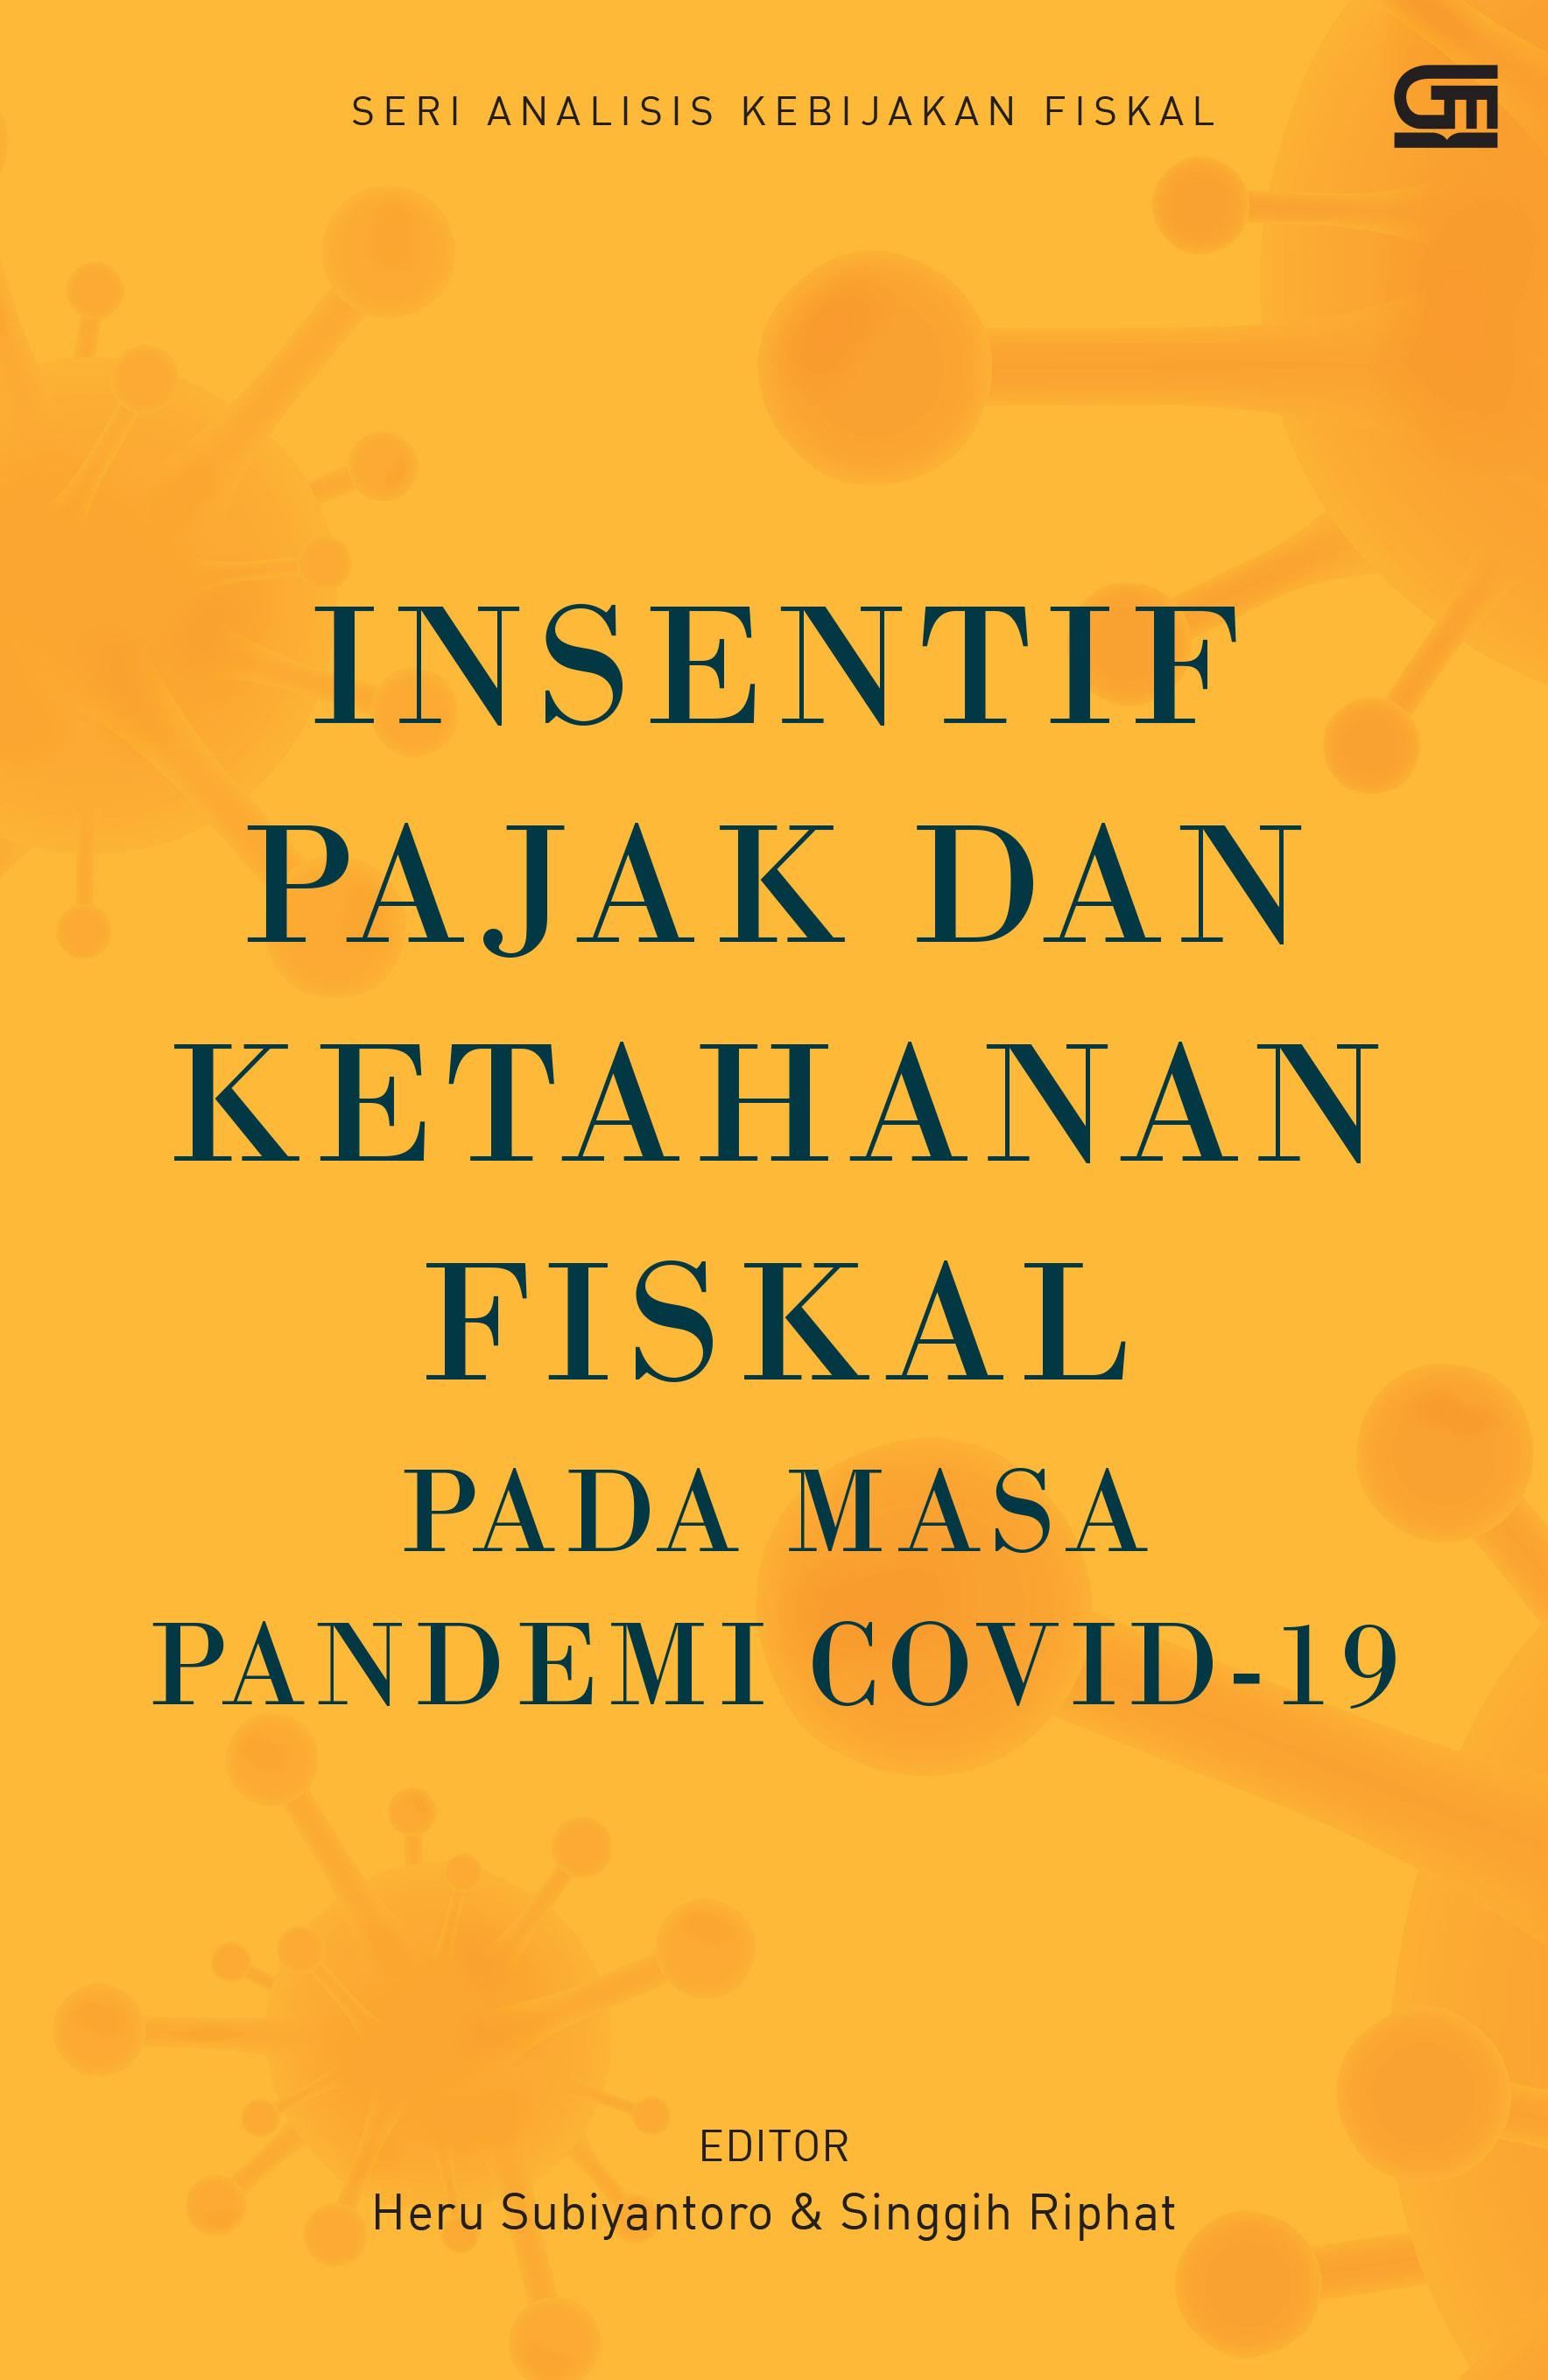 Insentif Pajak & Ketahanan Fiskal di Masa Pandemi Covid-19